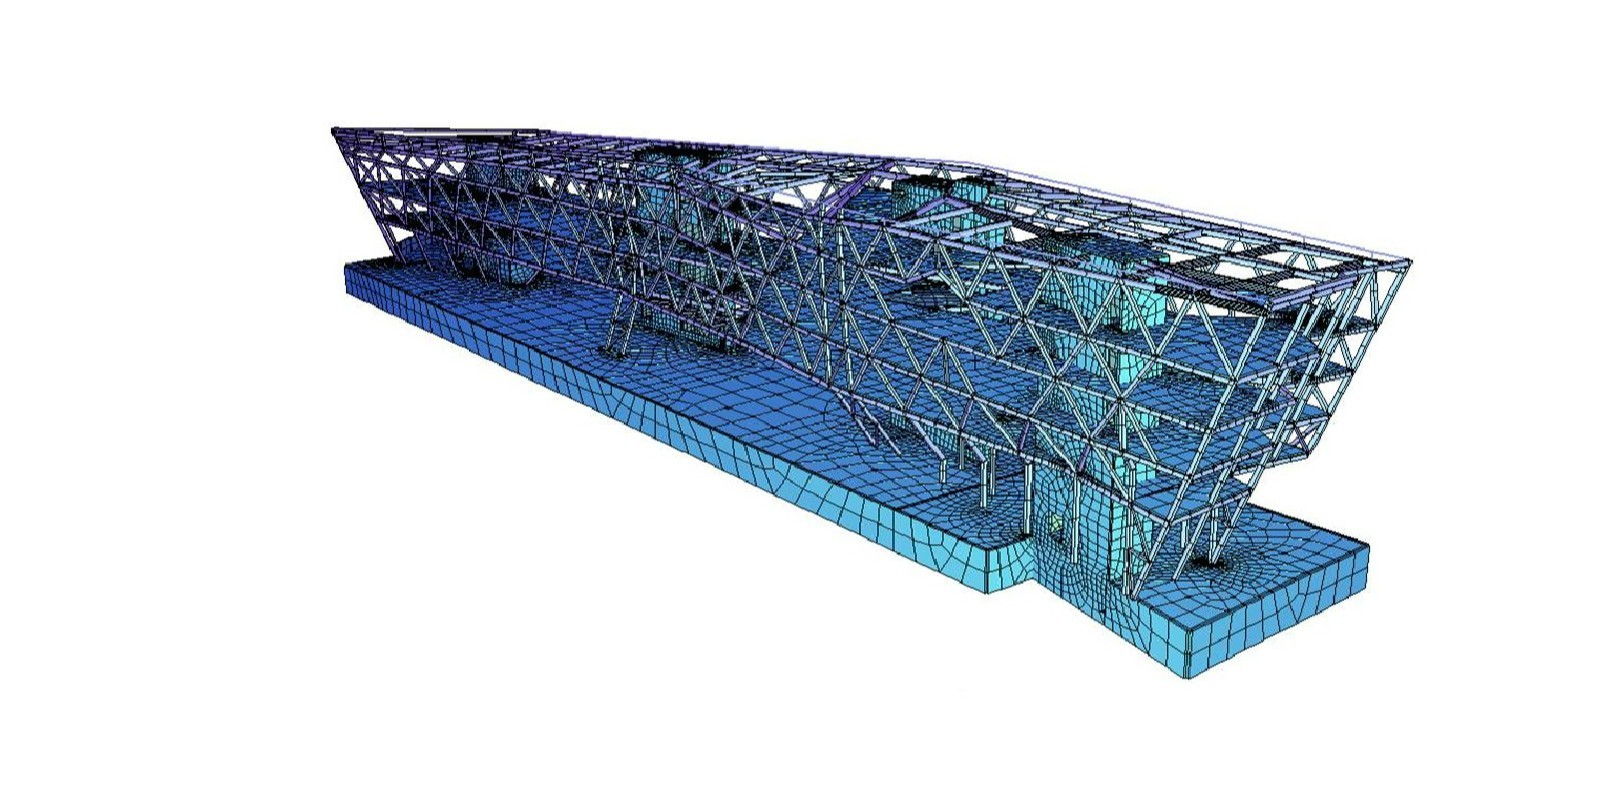 Library_Sevilla_building_design_infrastructure_ADA__Idom04